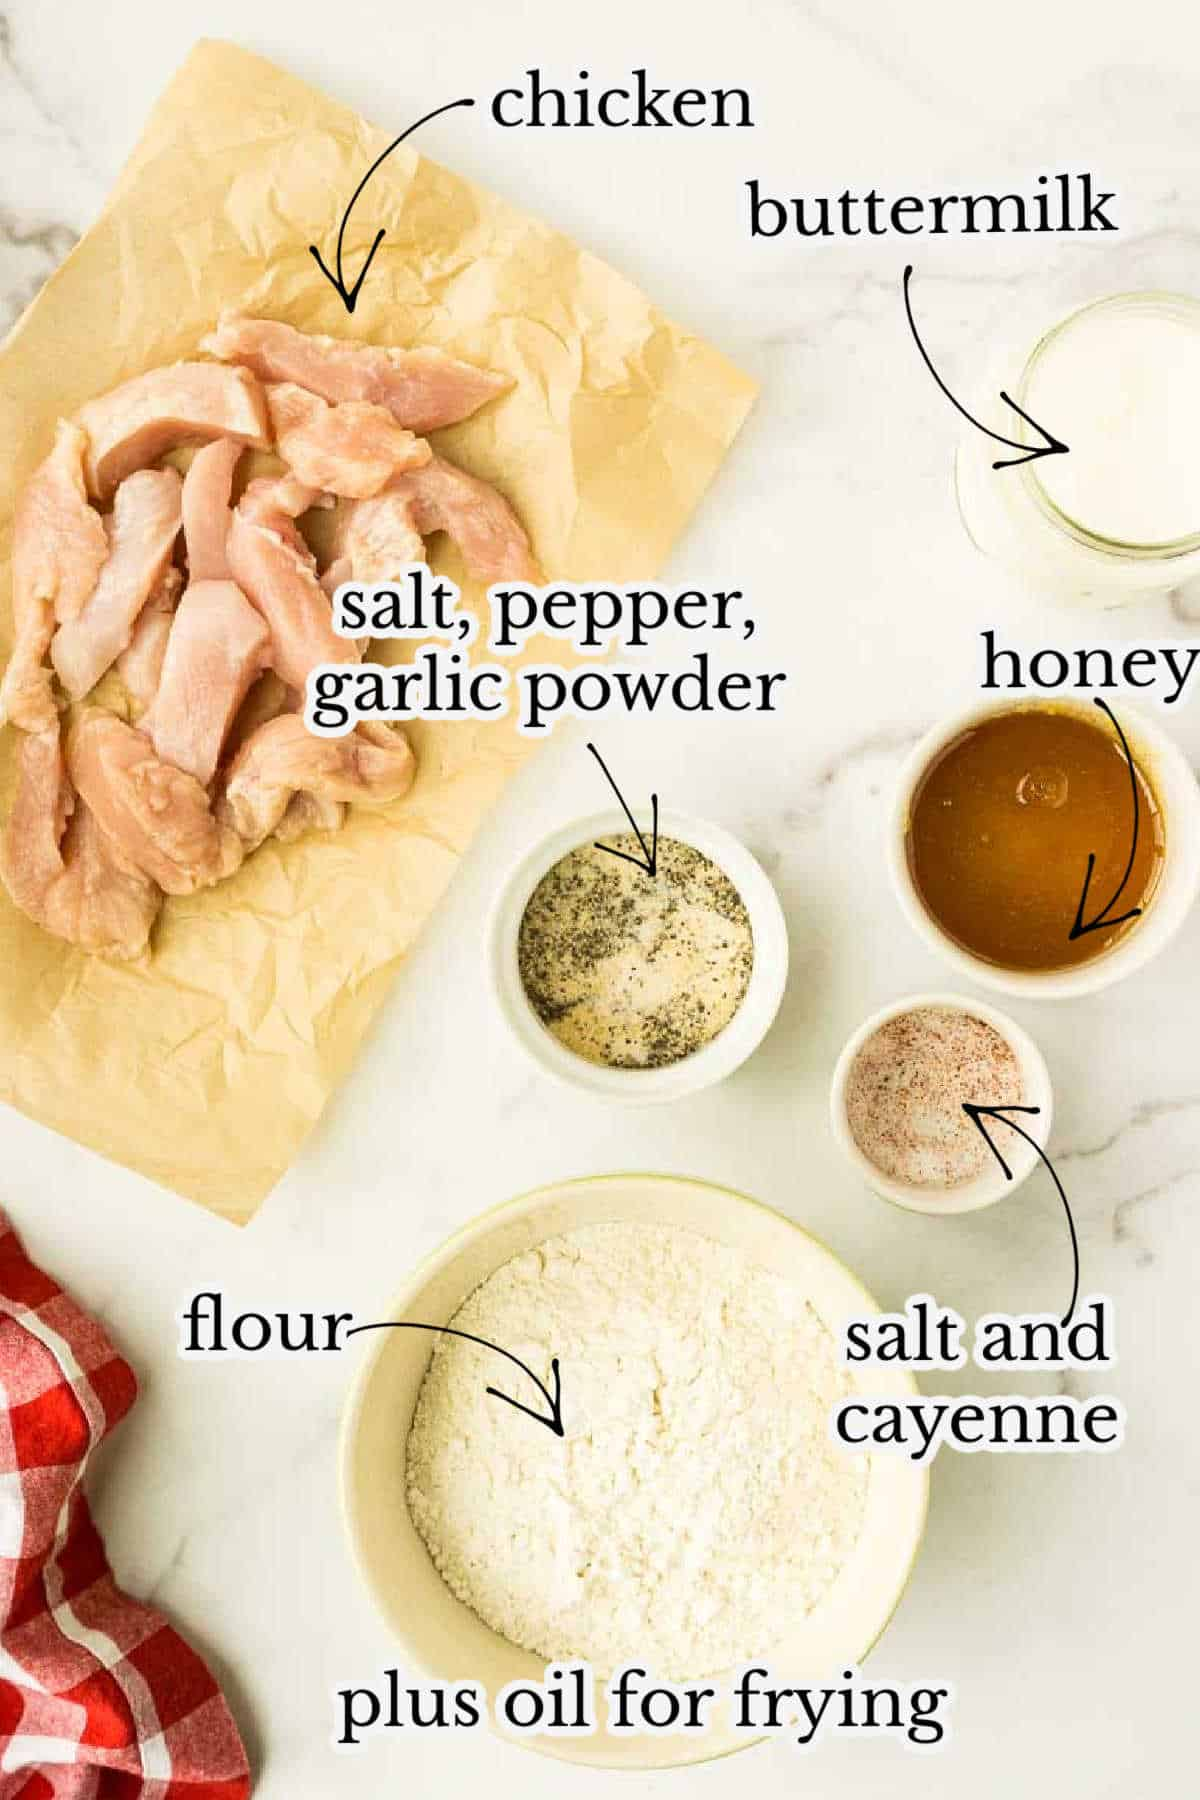 buttermilk, honey, chicken breast, flour, and seasoning on counter